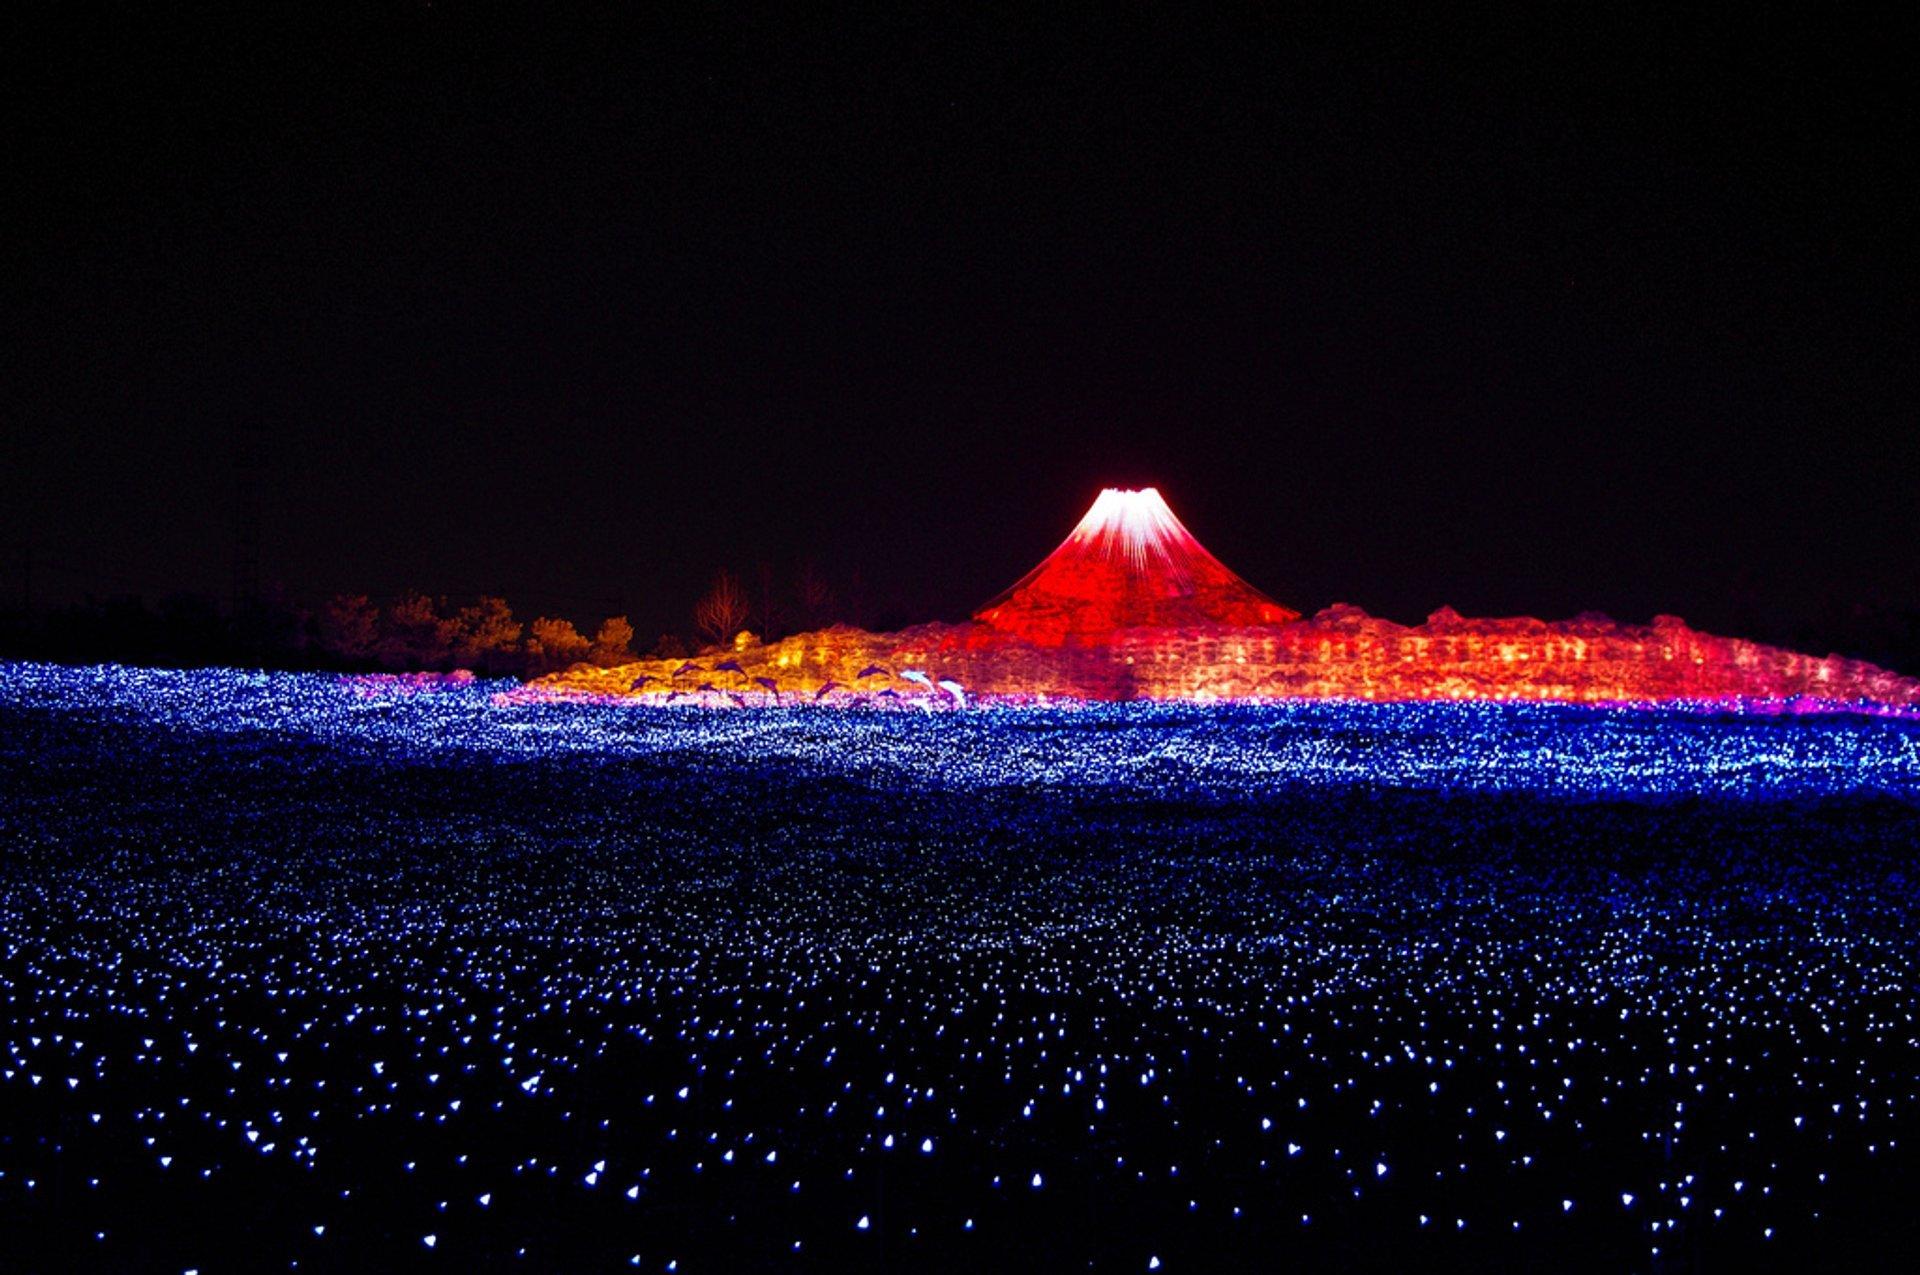 Nabana No Sato Winter Illumination in Japan - Best Time